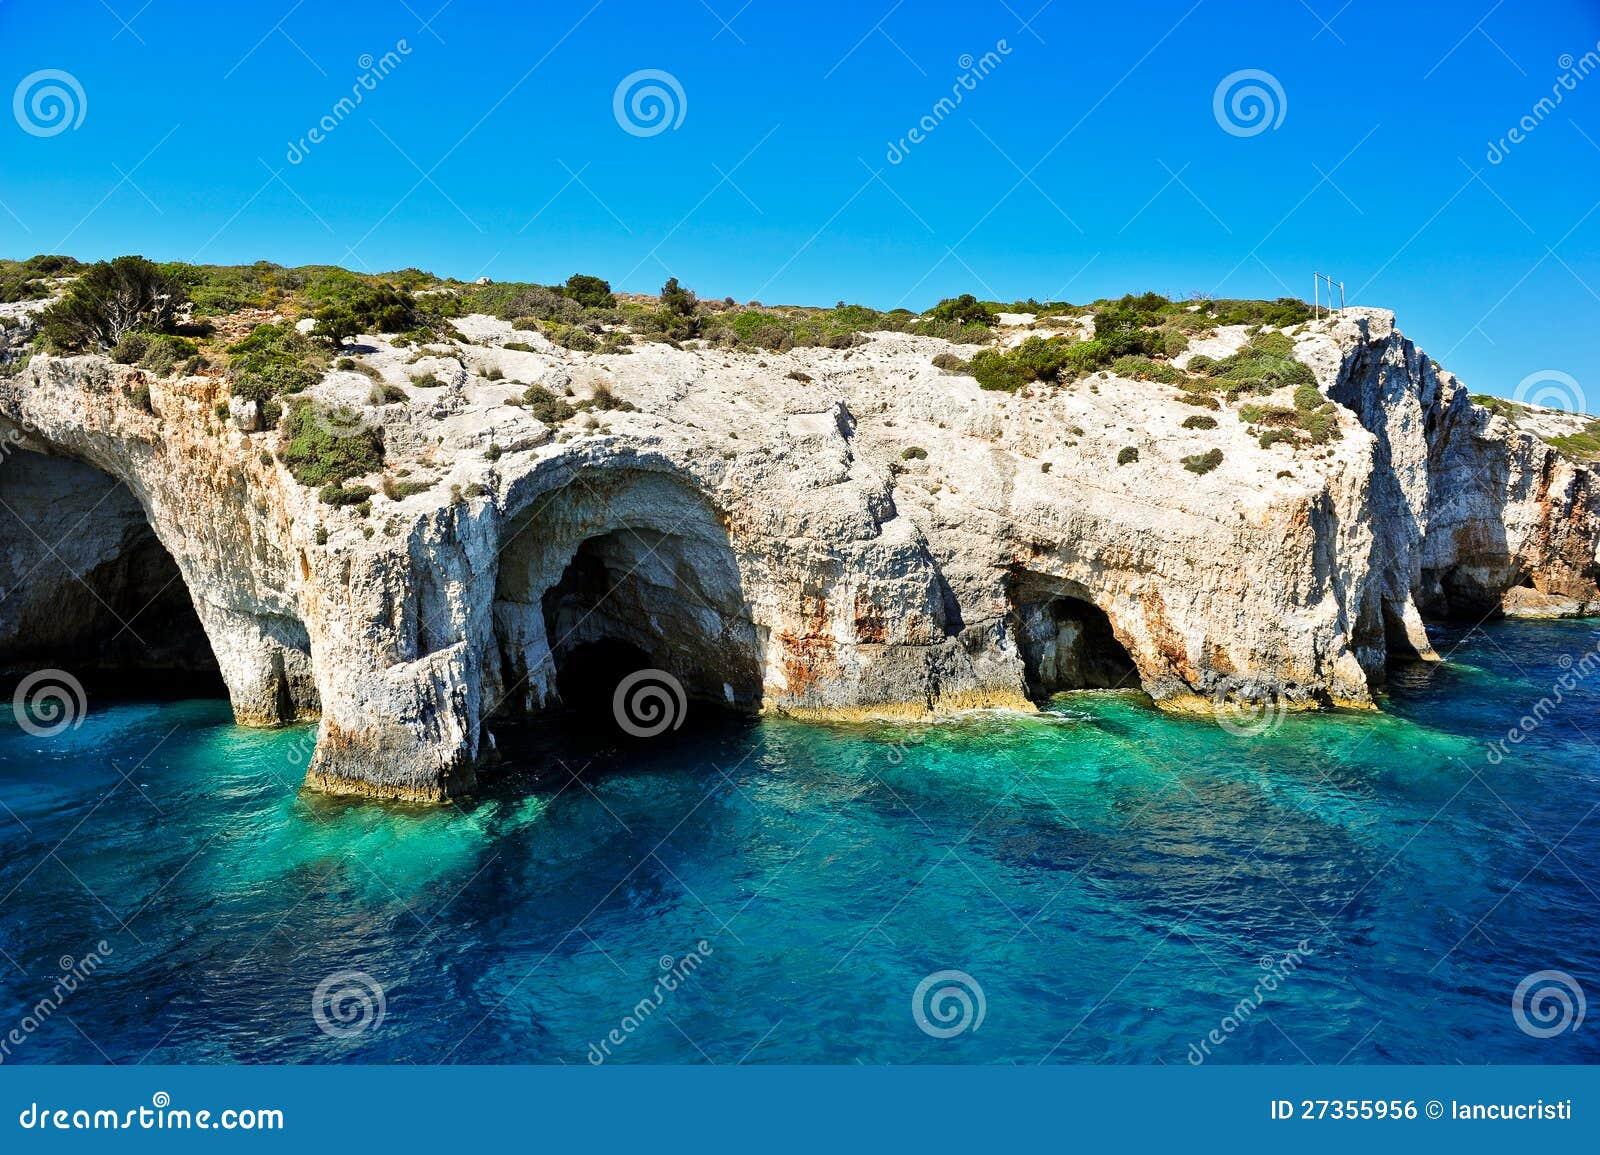 Zakynthos Island Greece  city photos gallery : Blue caves on Zakynthos island, Greece .Famous caves with crystal ...